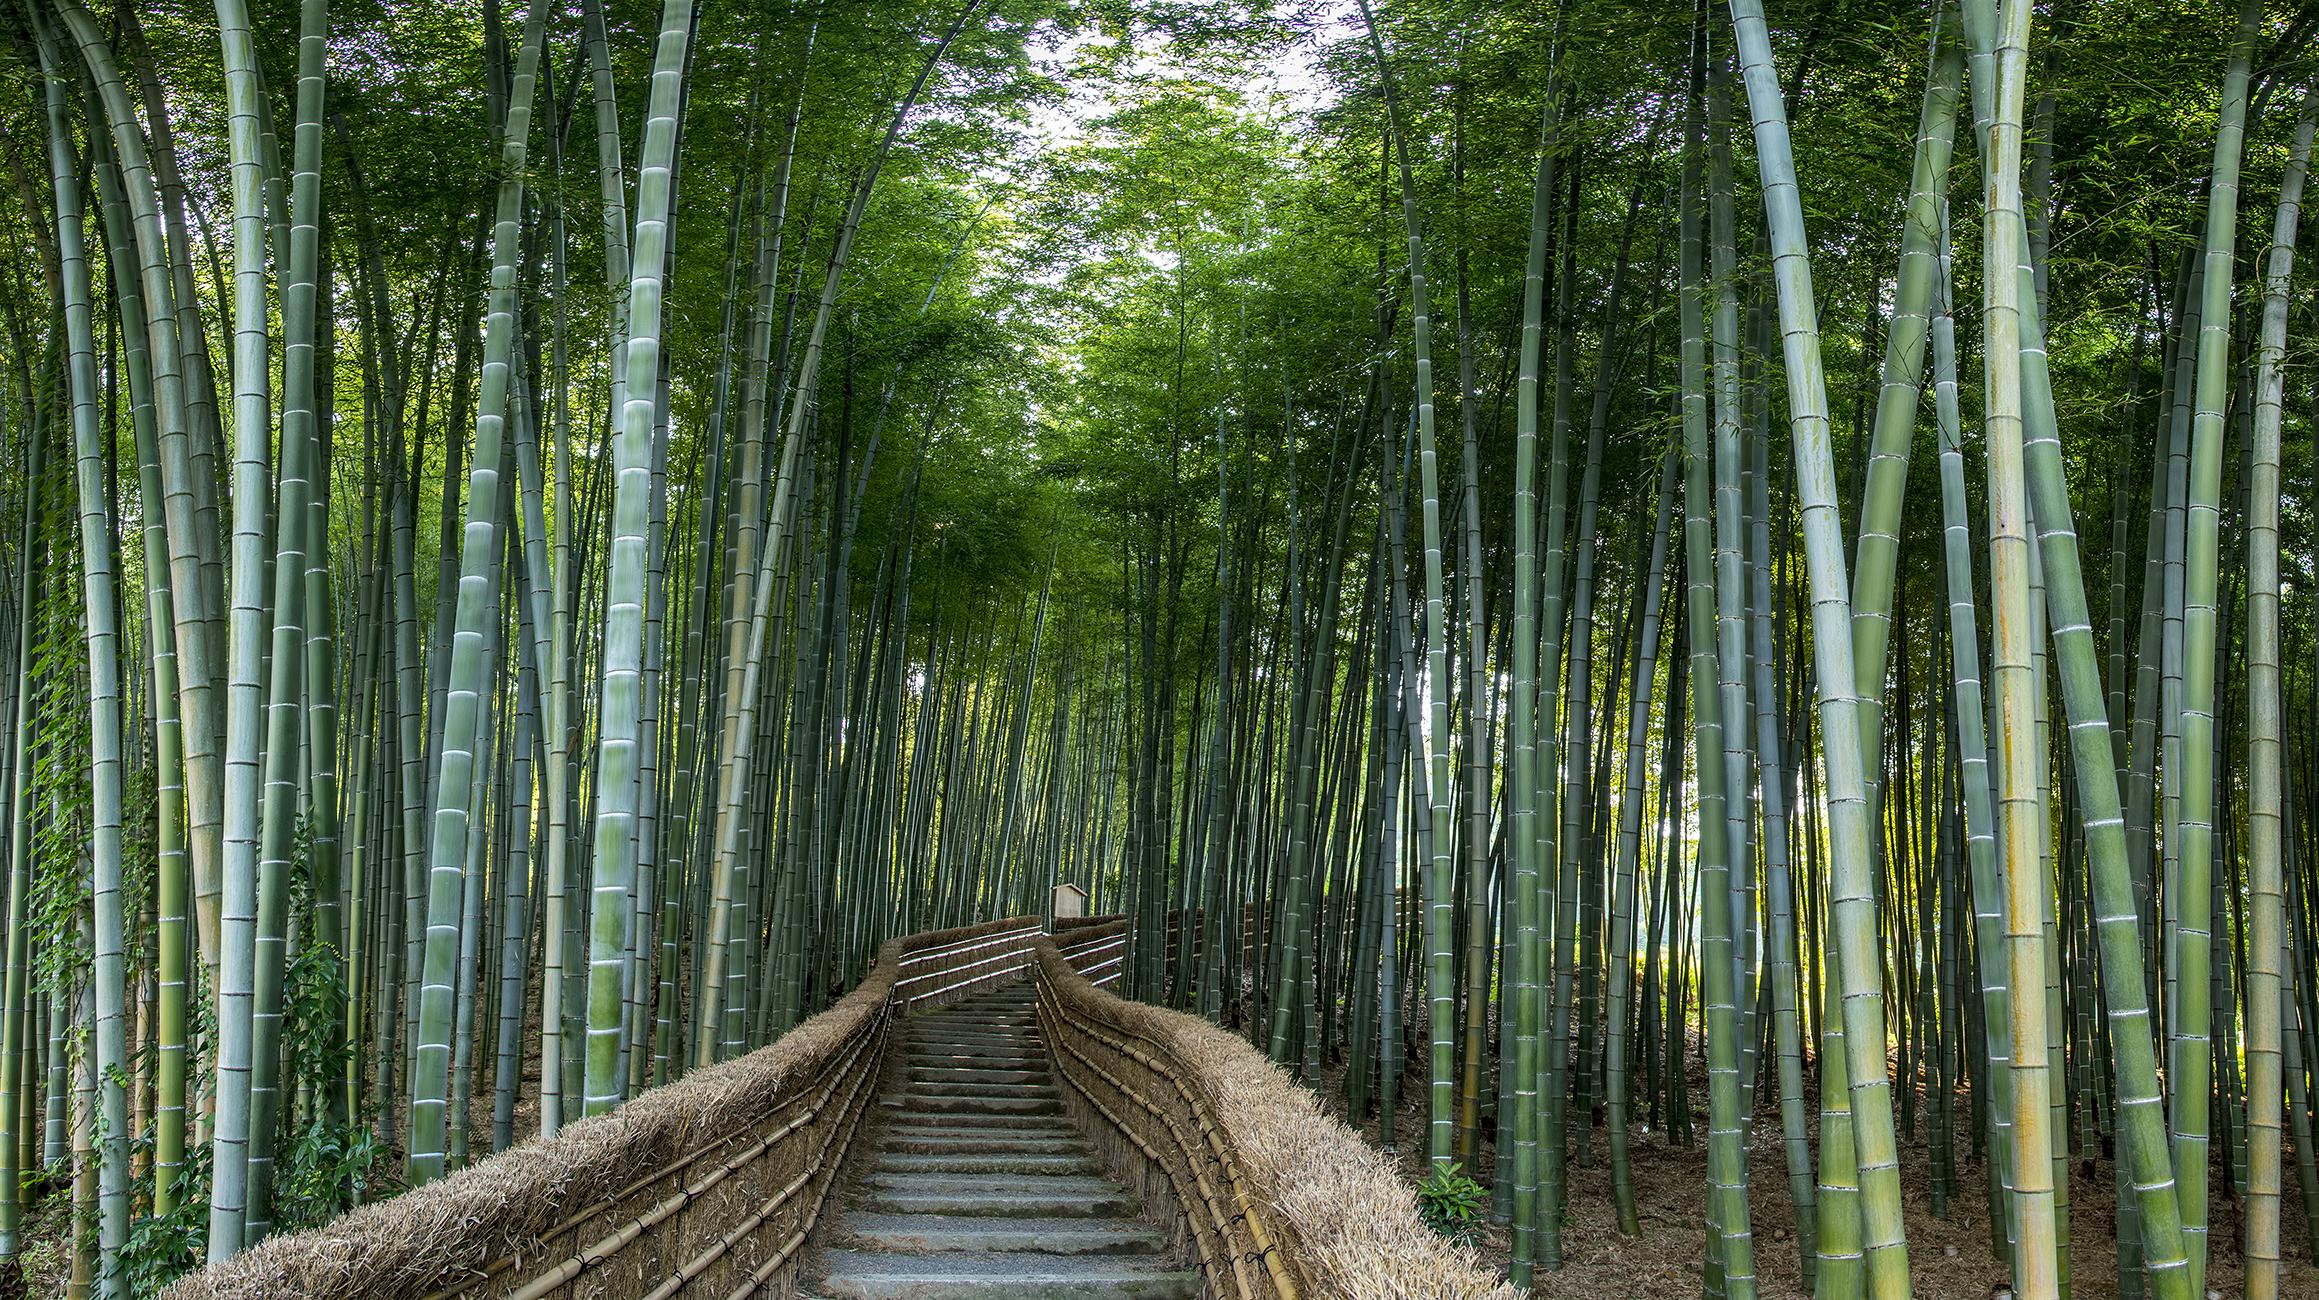 Five Photo Photomerge Bamboo Stairs Nenbutsuji